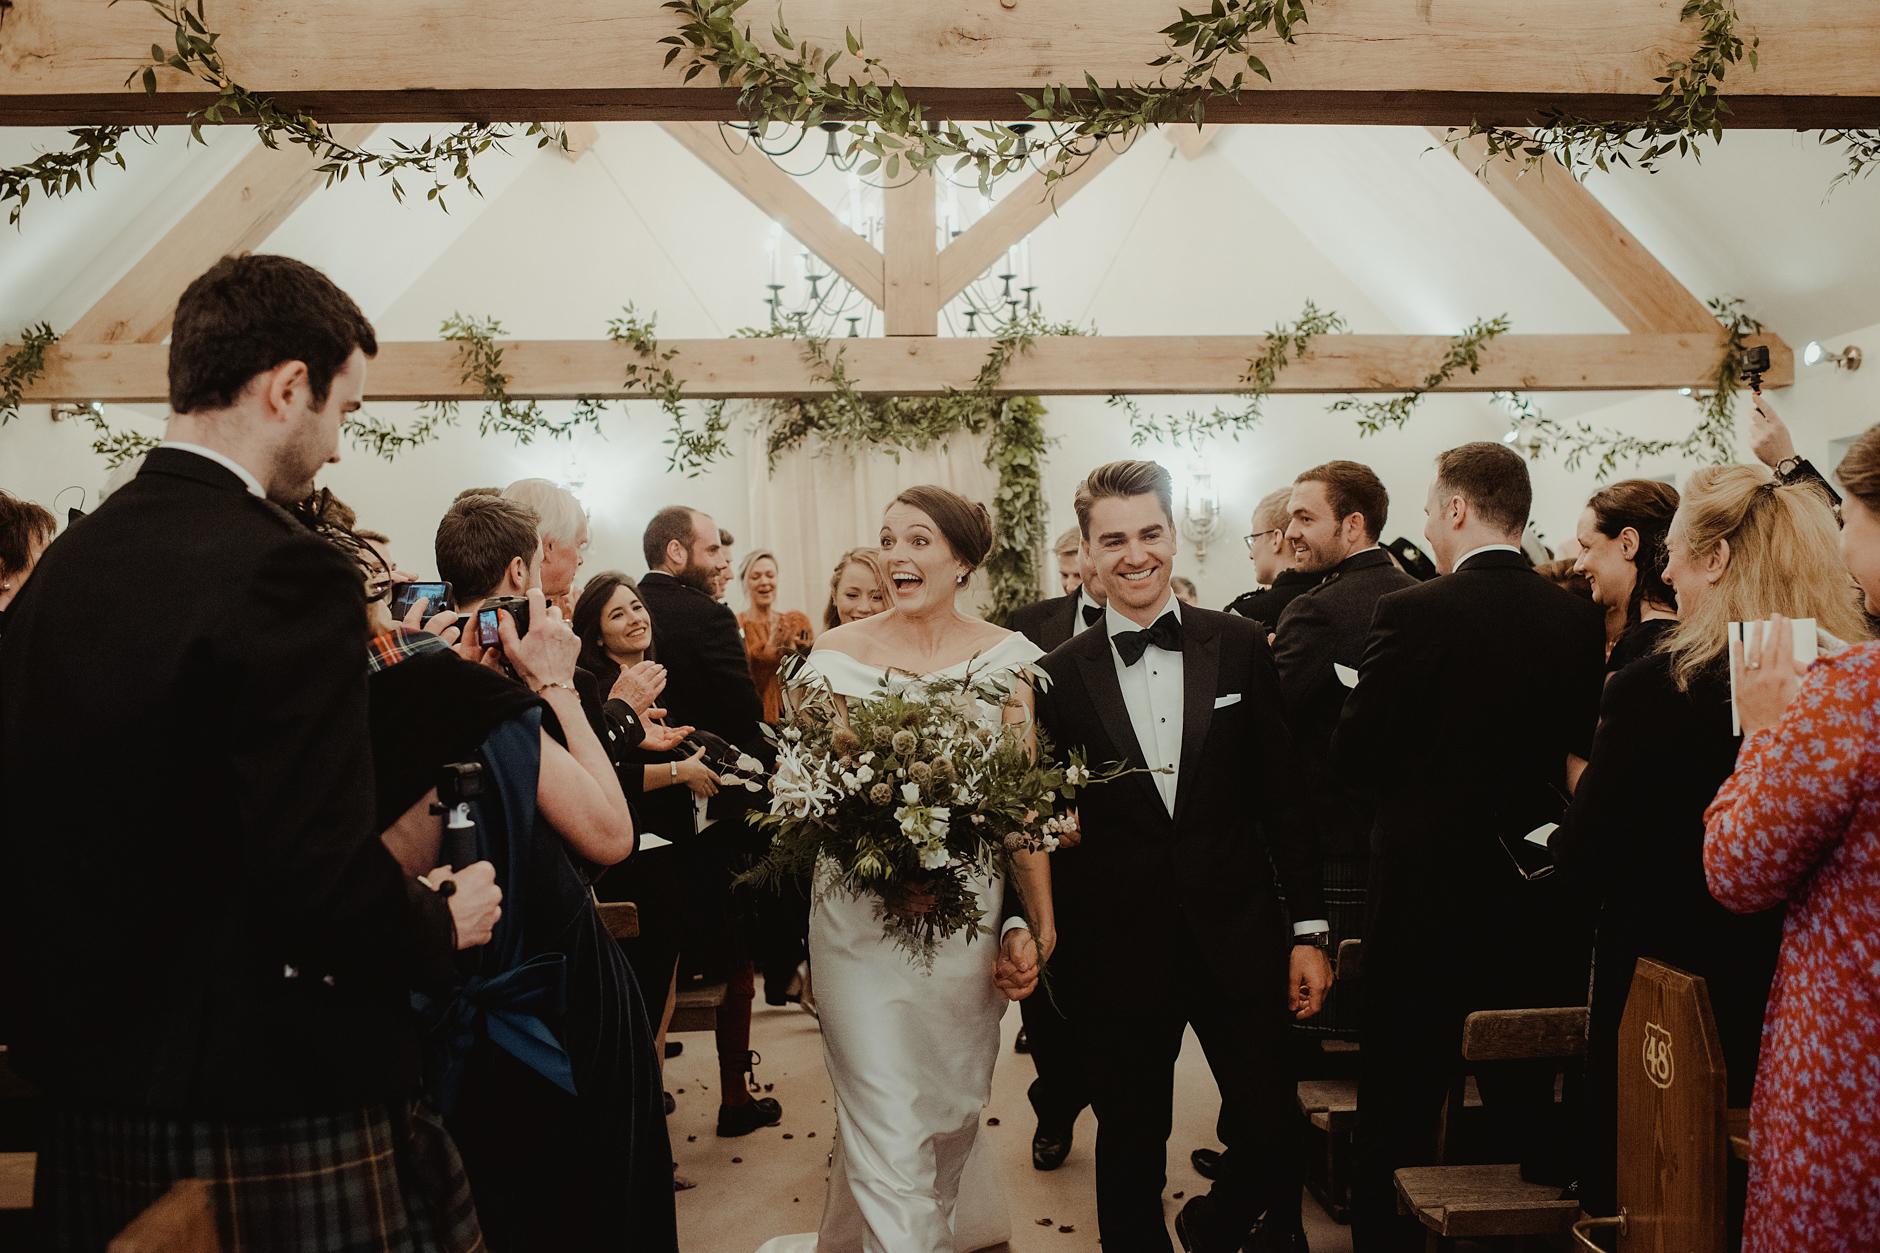 Glentruim-Wedding-Nikki-Leadbetter-Photography-112.jpg